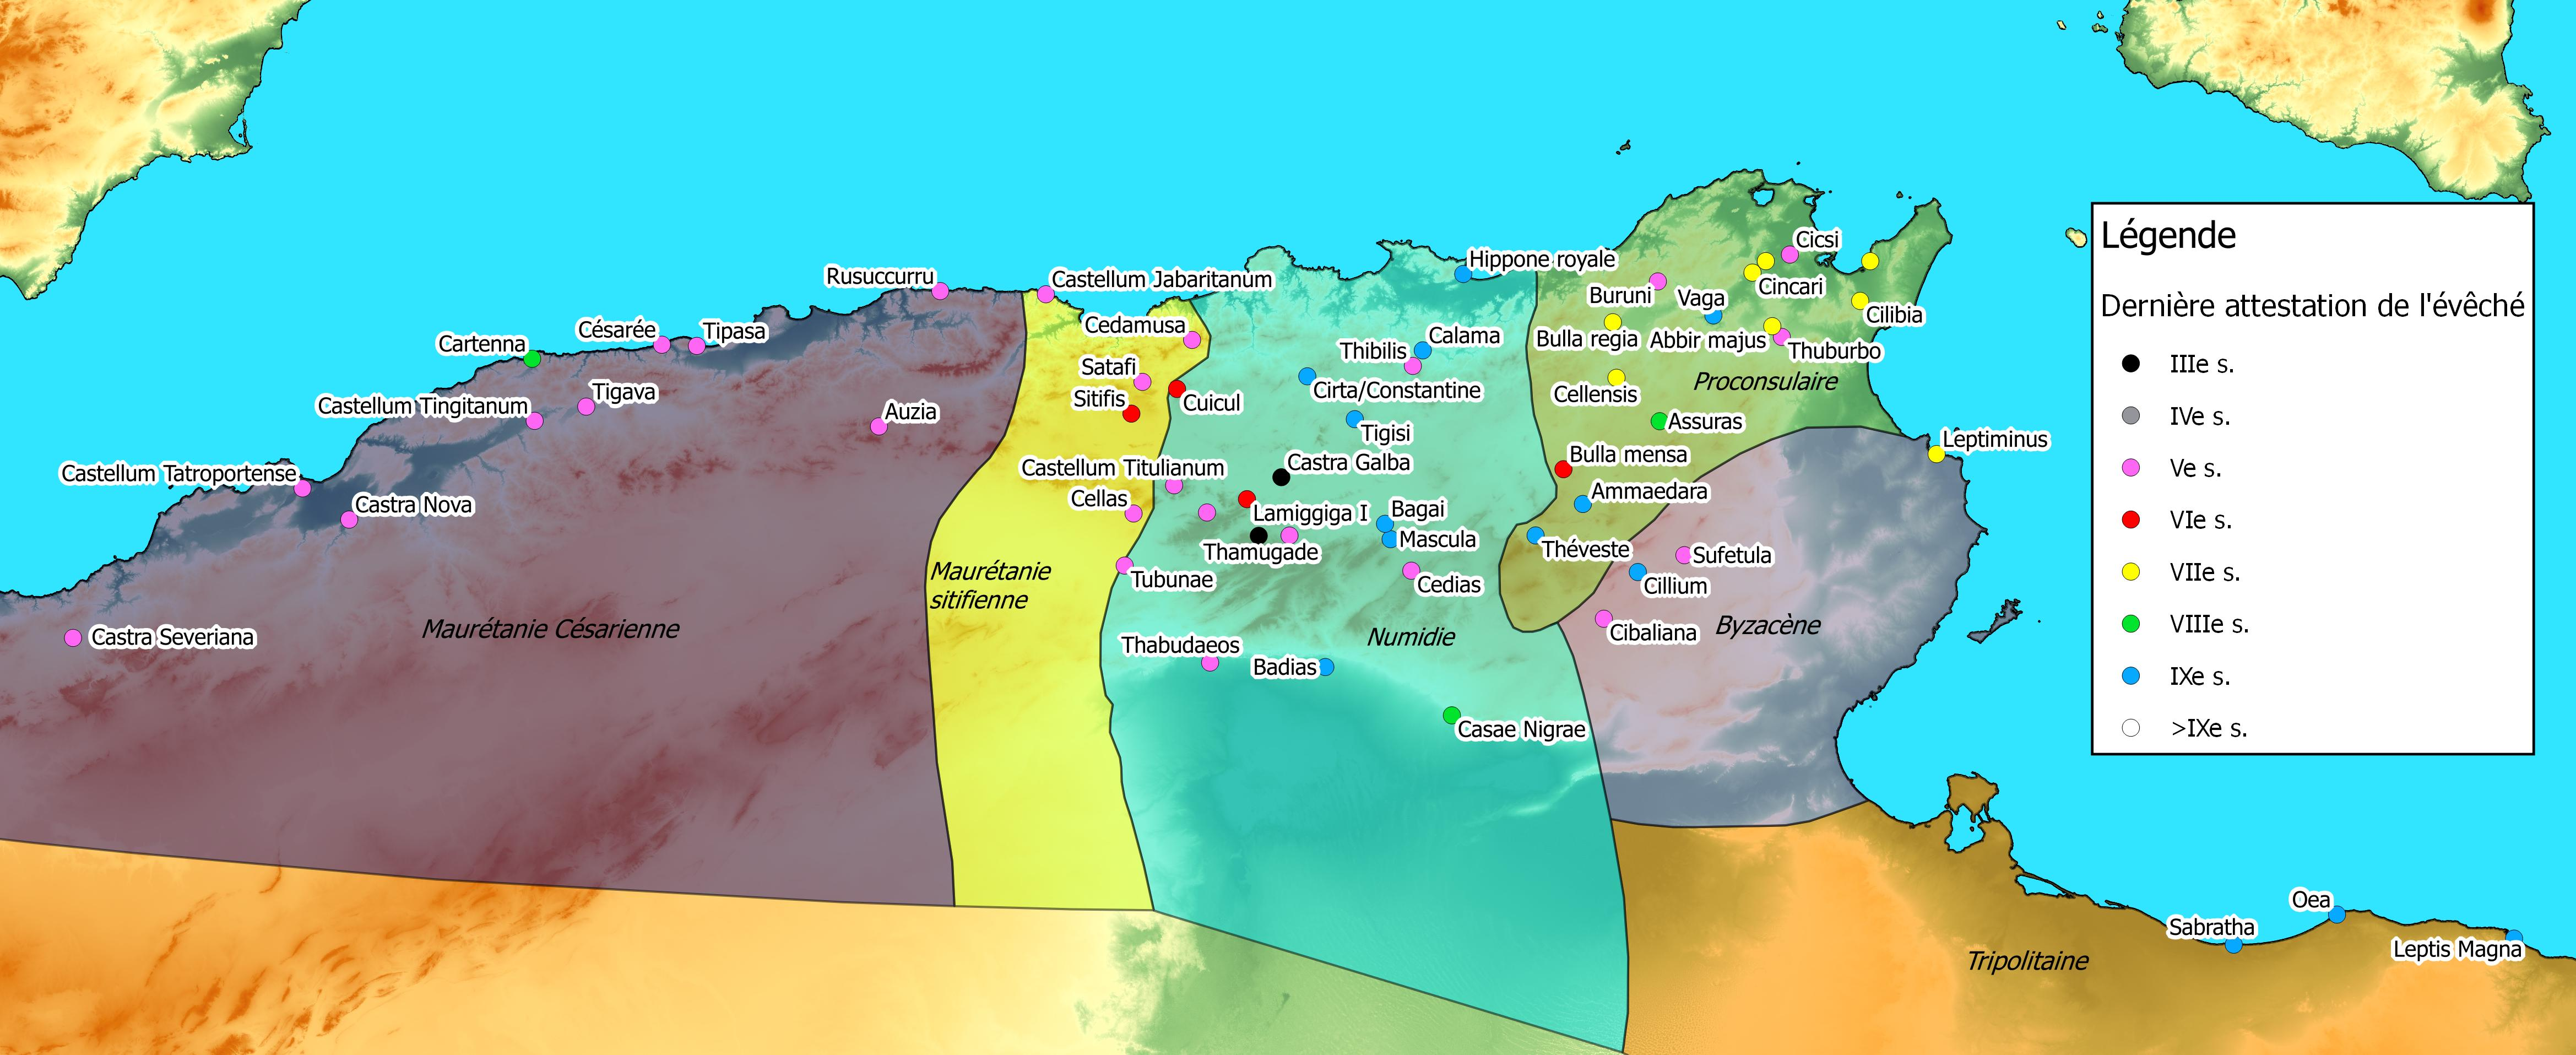 Ménestrel Editions > Mapping the Medieval World > Resources - Ménestrel